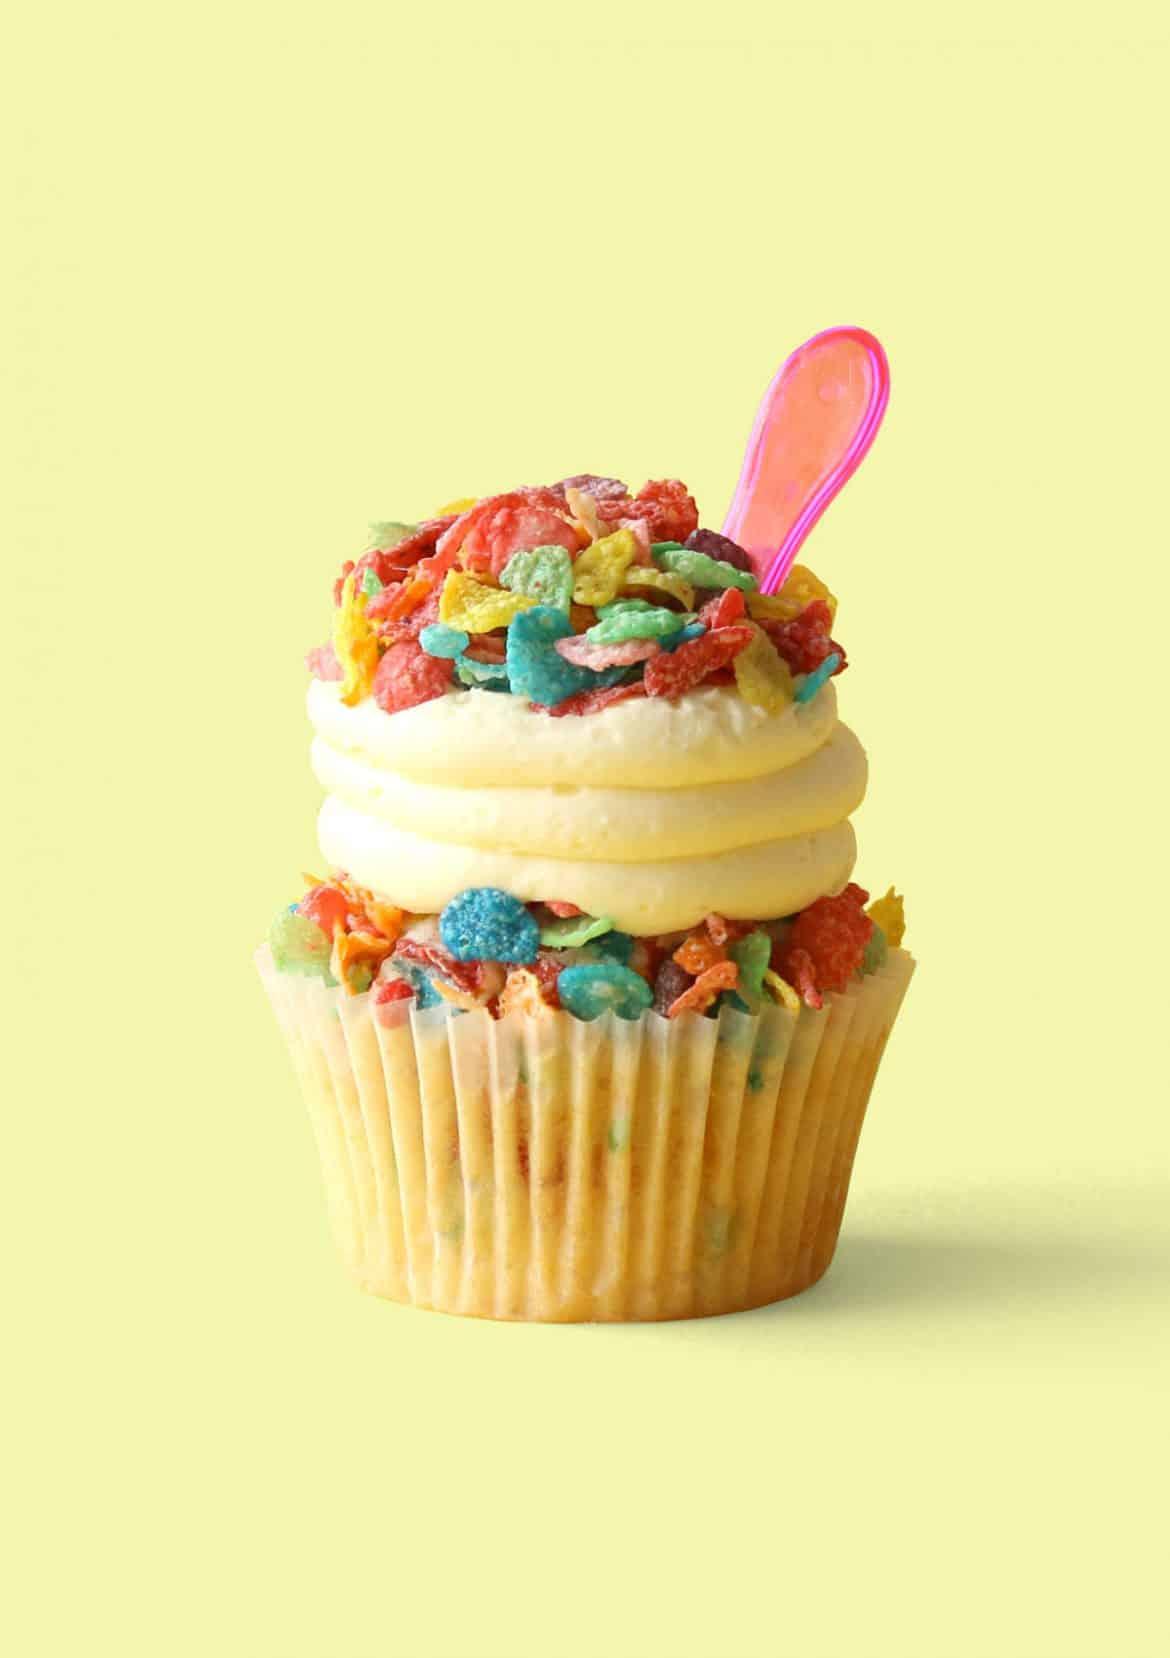 Saturday Morning Breakfast Cereal Cupcakes